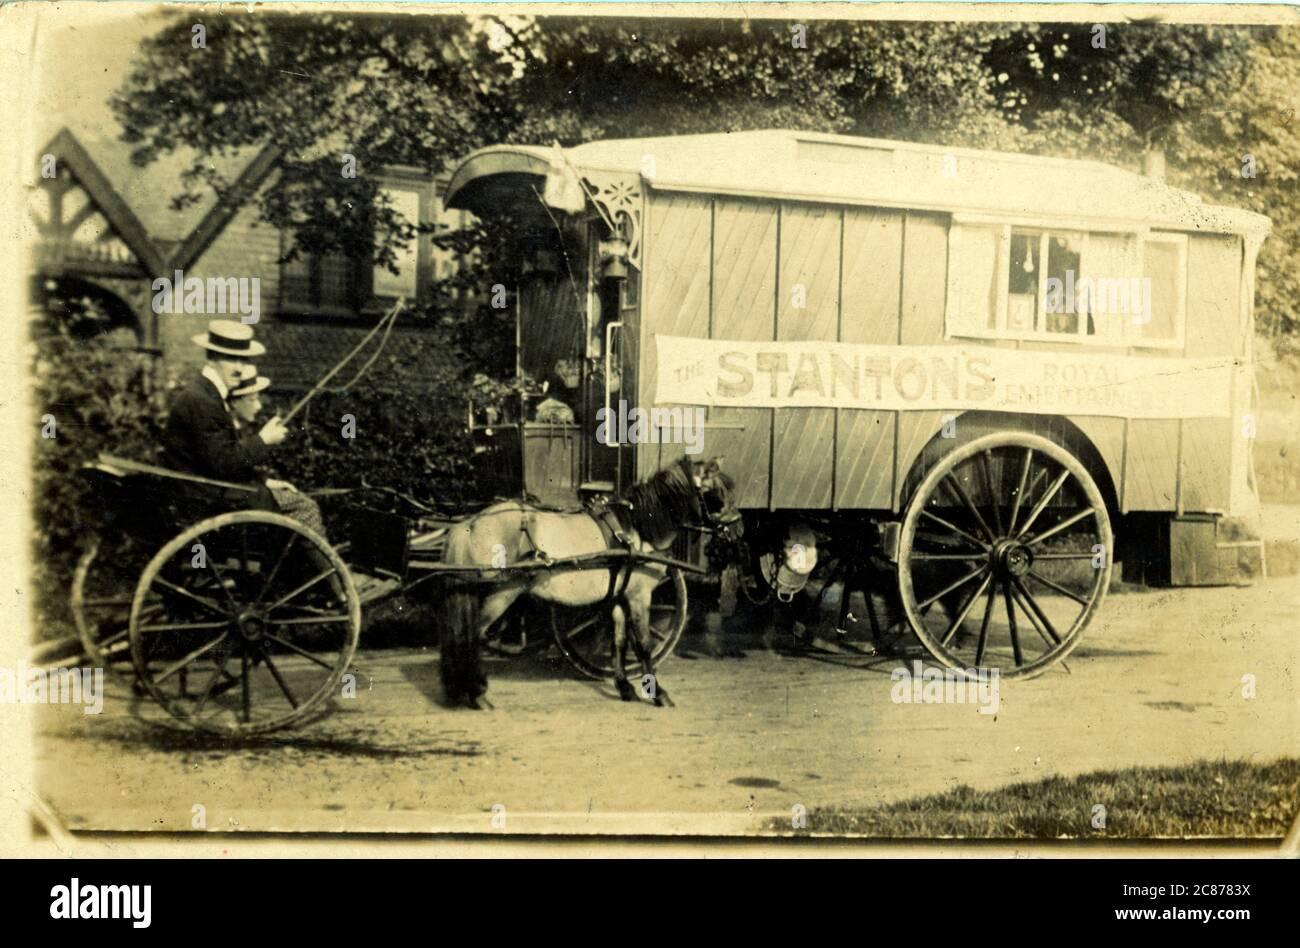 Vintage Caravan (Stanton's Royal Entertainers), Derby, Derbyshire, Angleterre. Banque D'Images